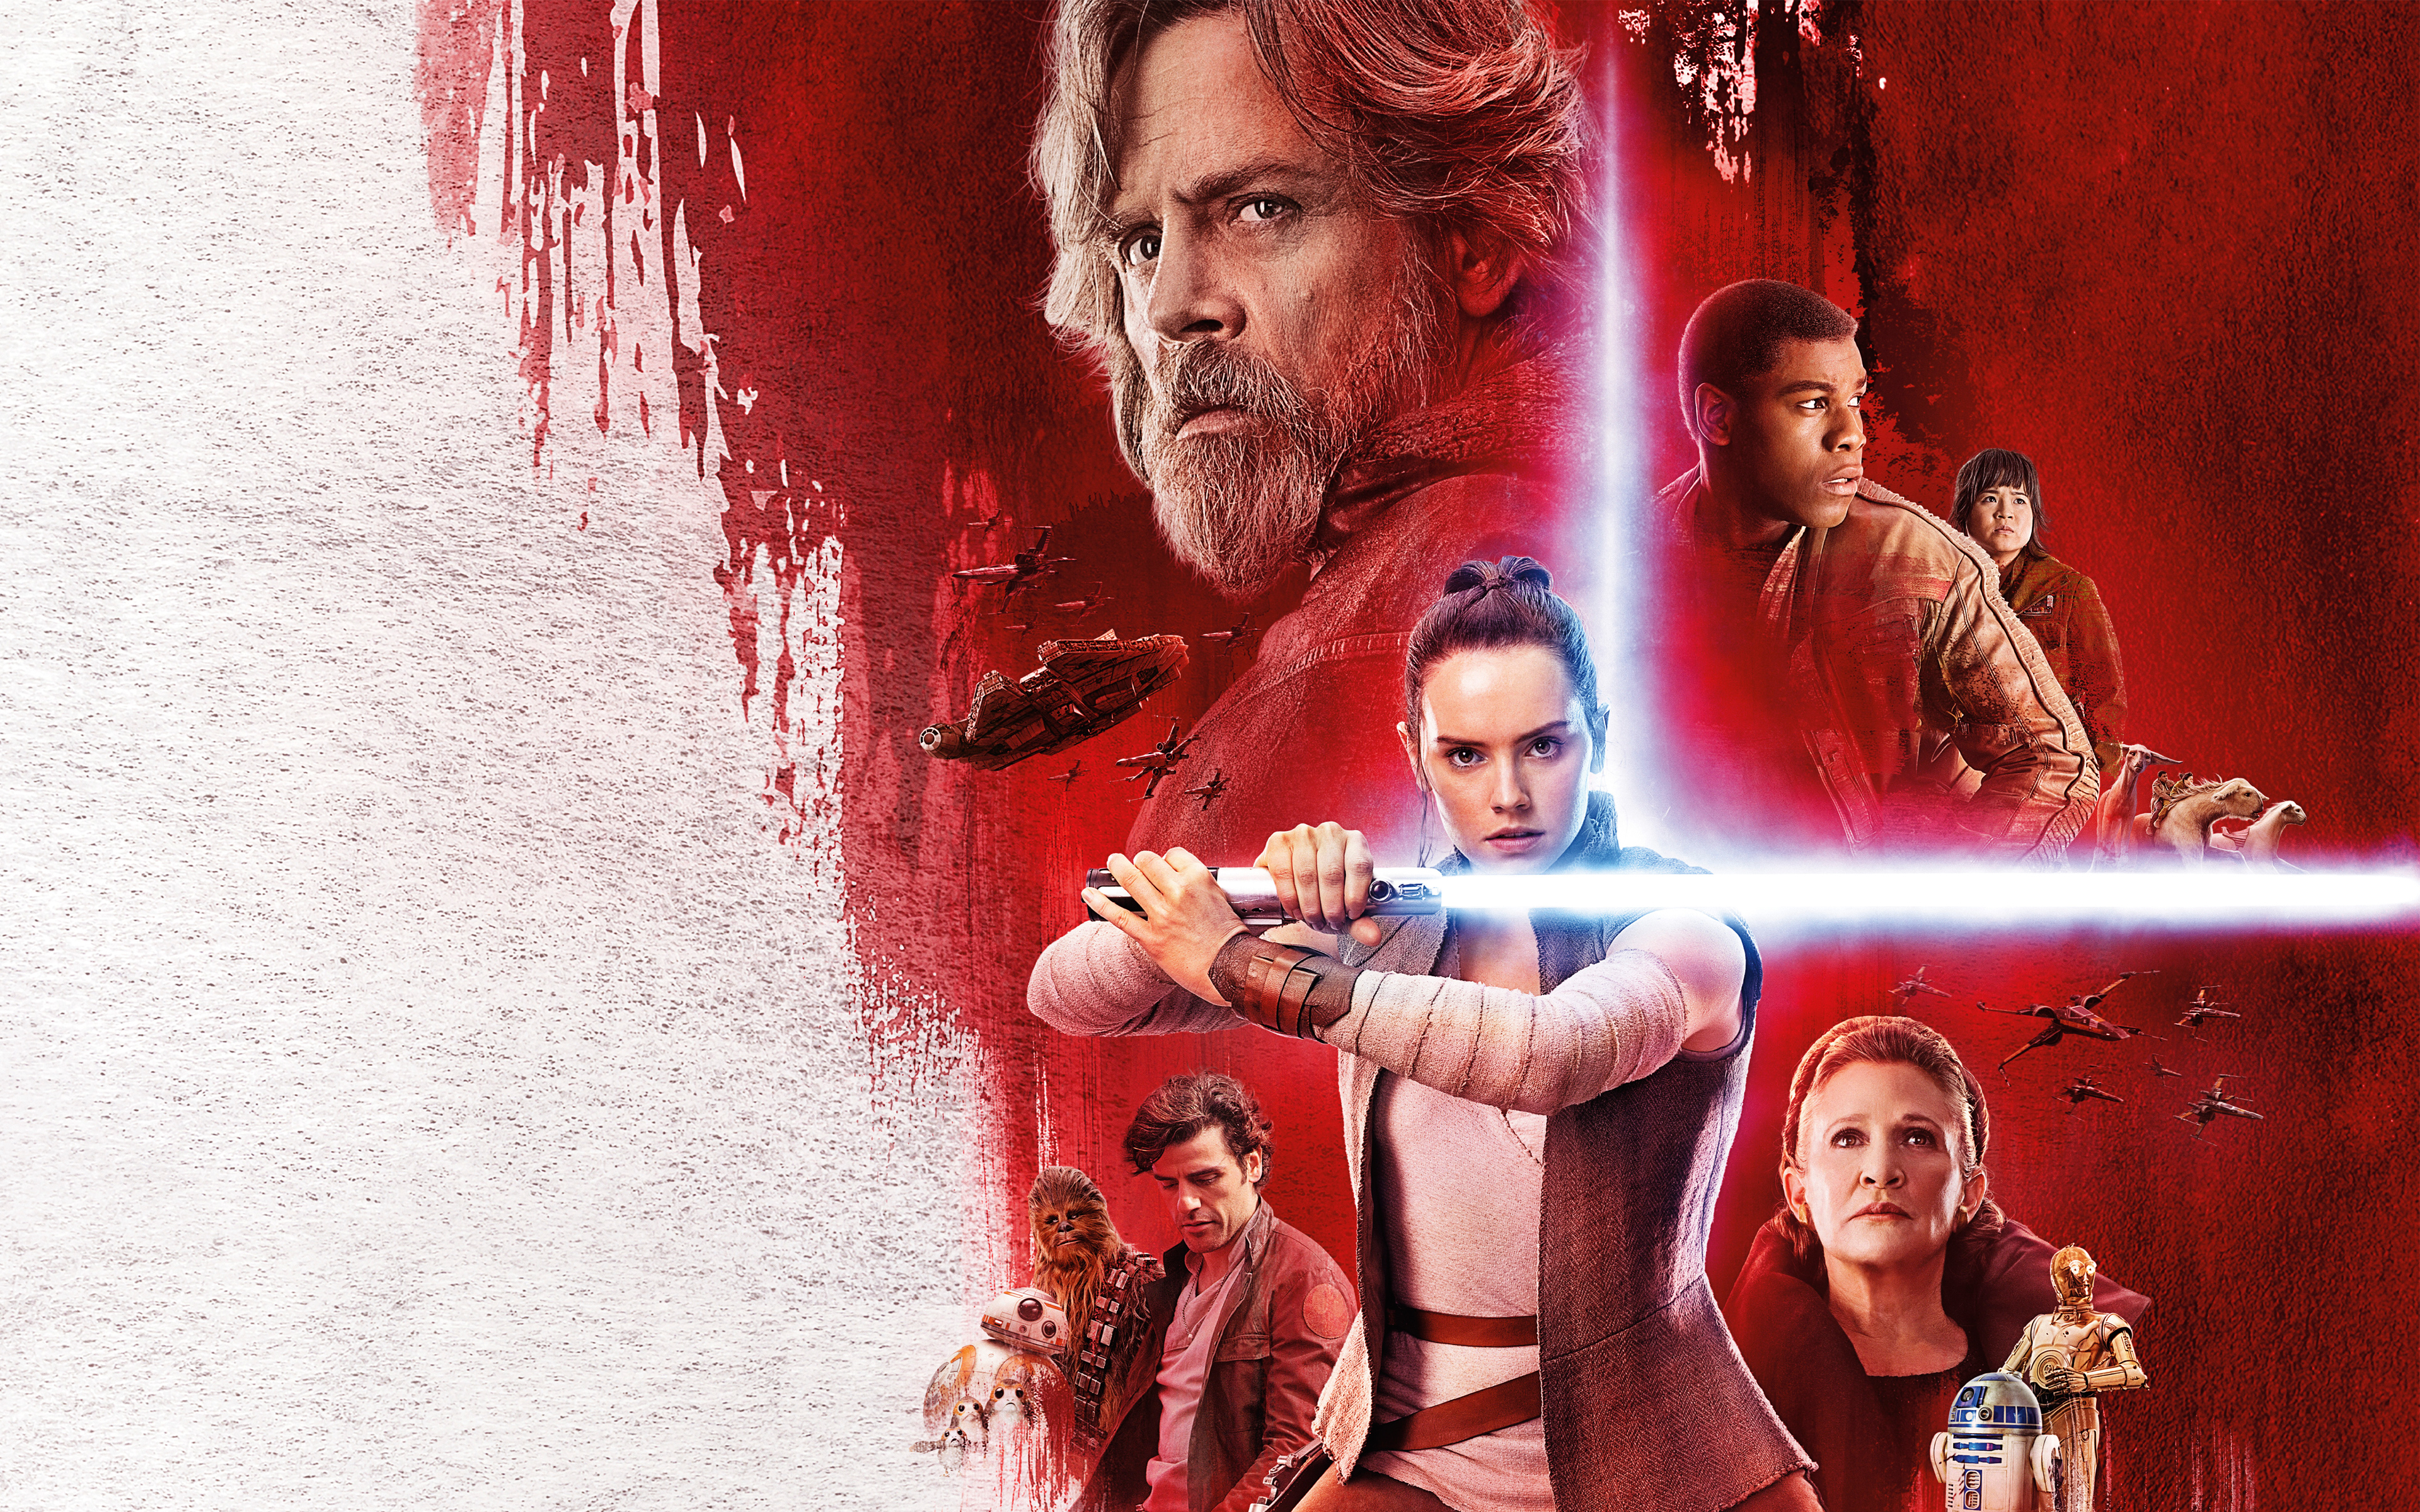 Star Wars 8 Poster Wallpaper Hd Movies 4k Wallpapers